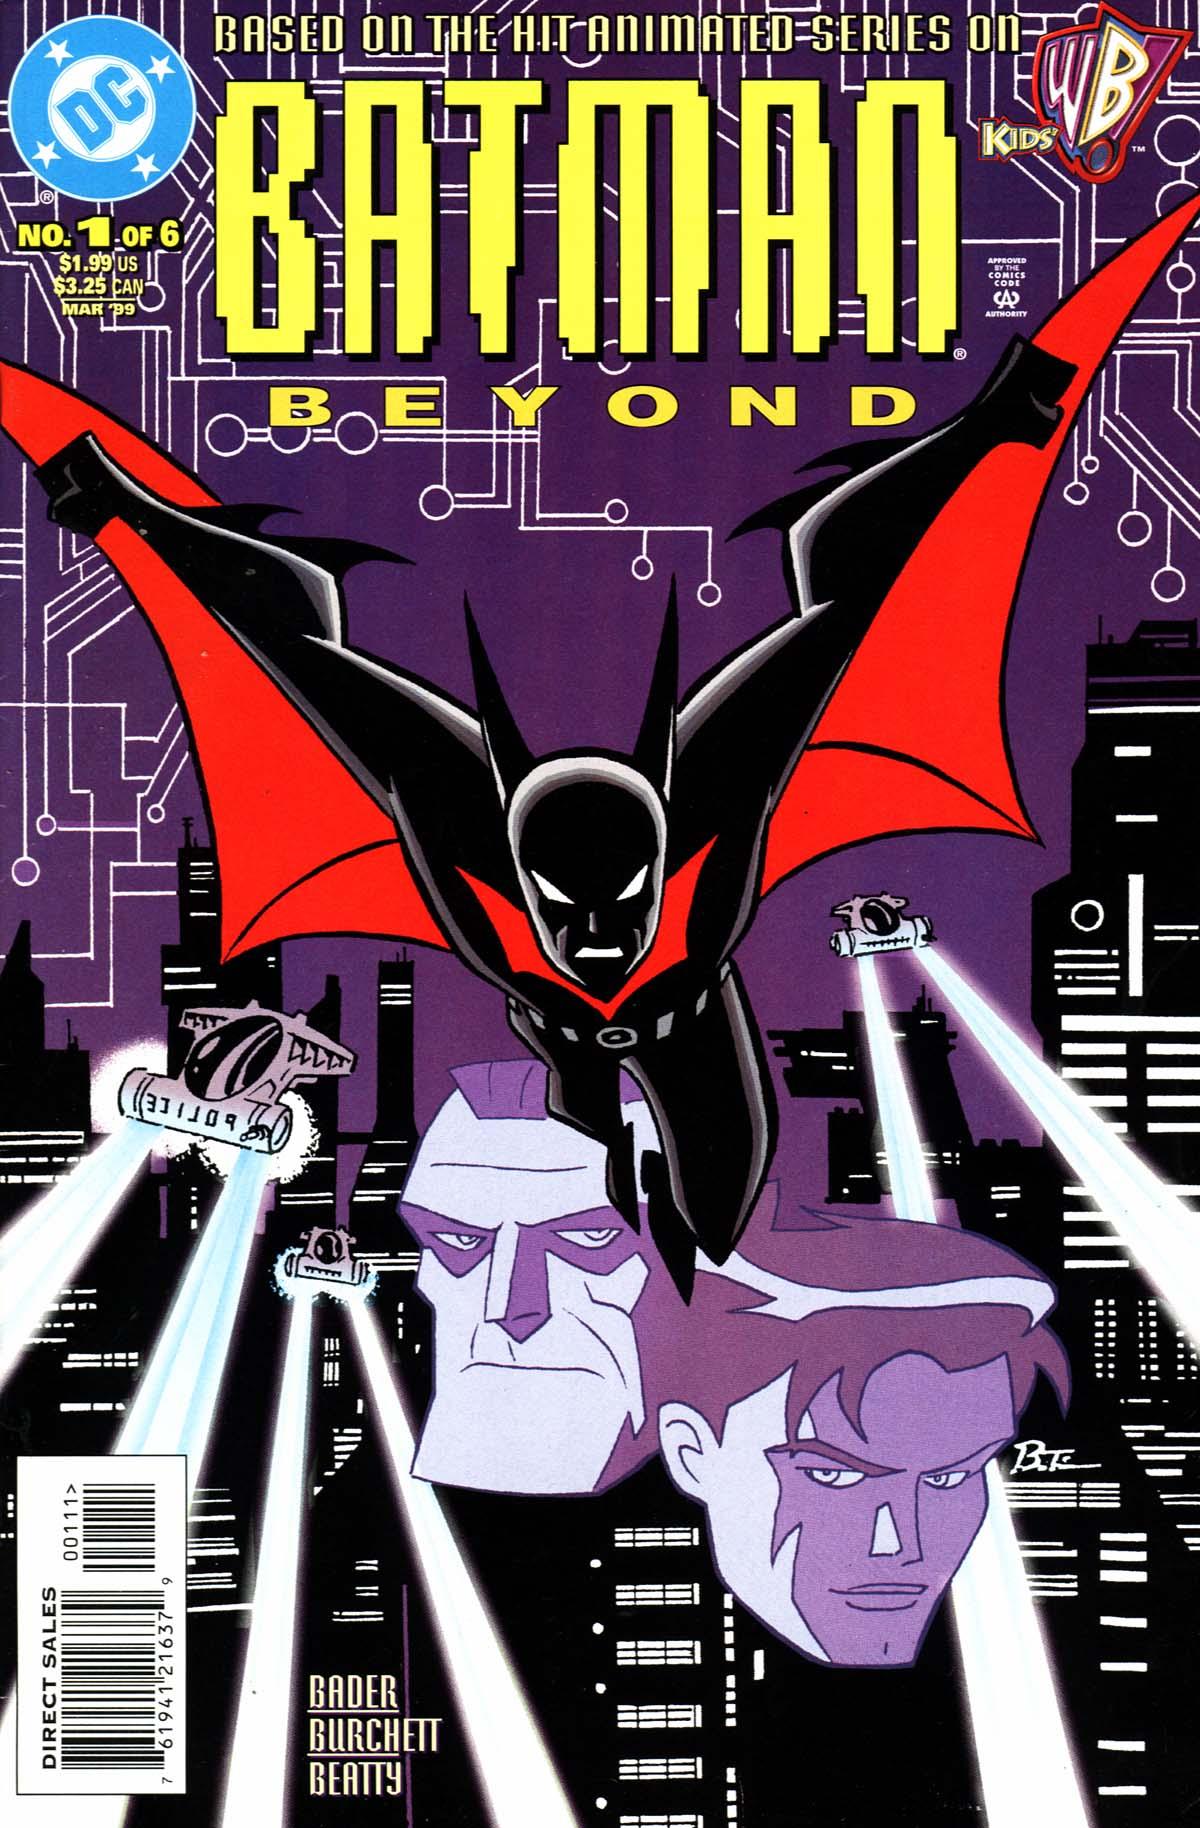 Book Cover Series Wiki ~ Batman beyond volume wiki fandom powered by